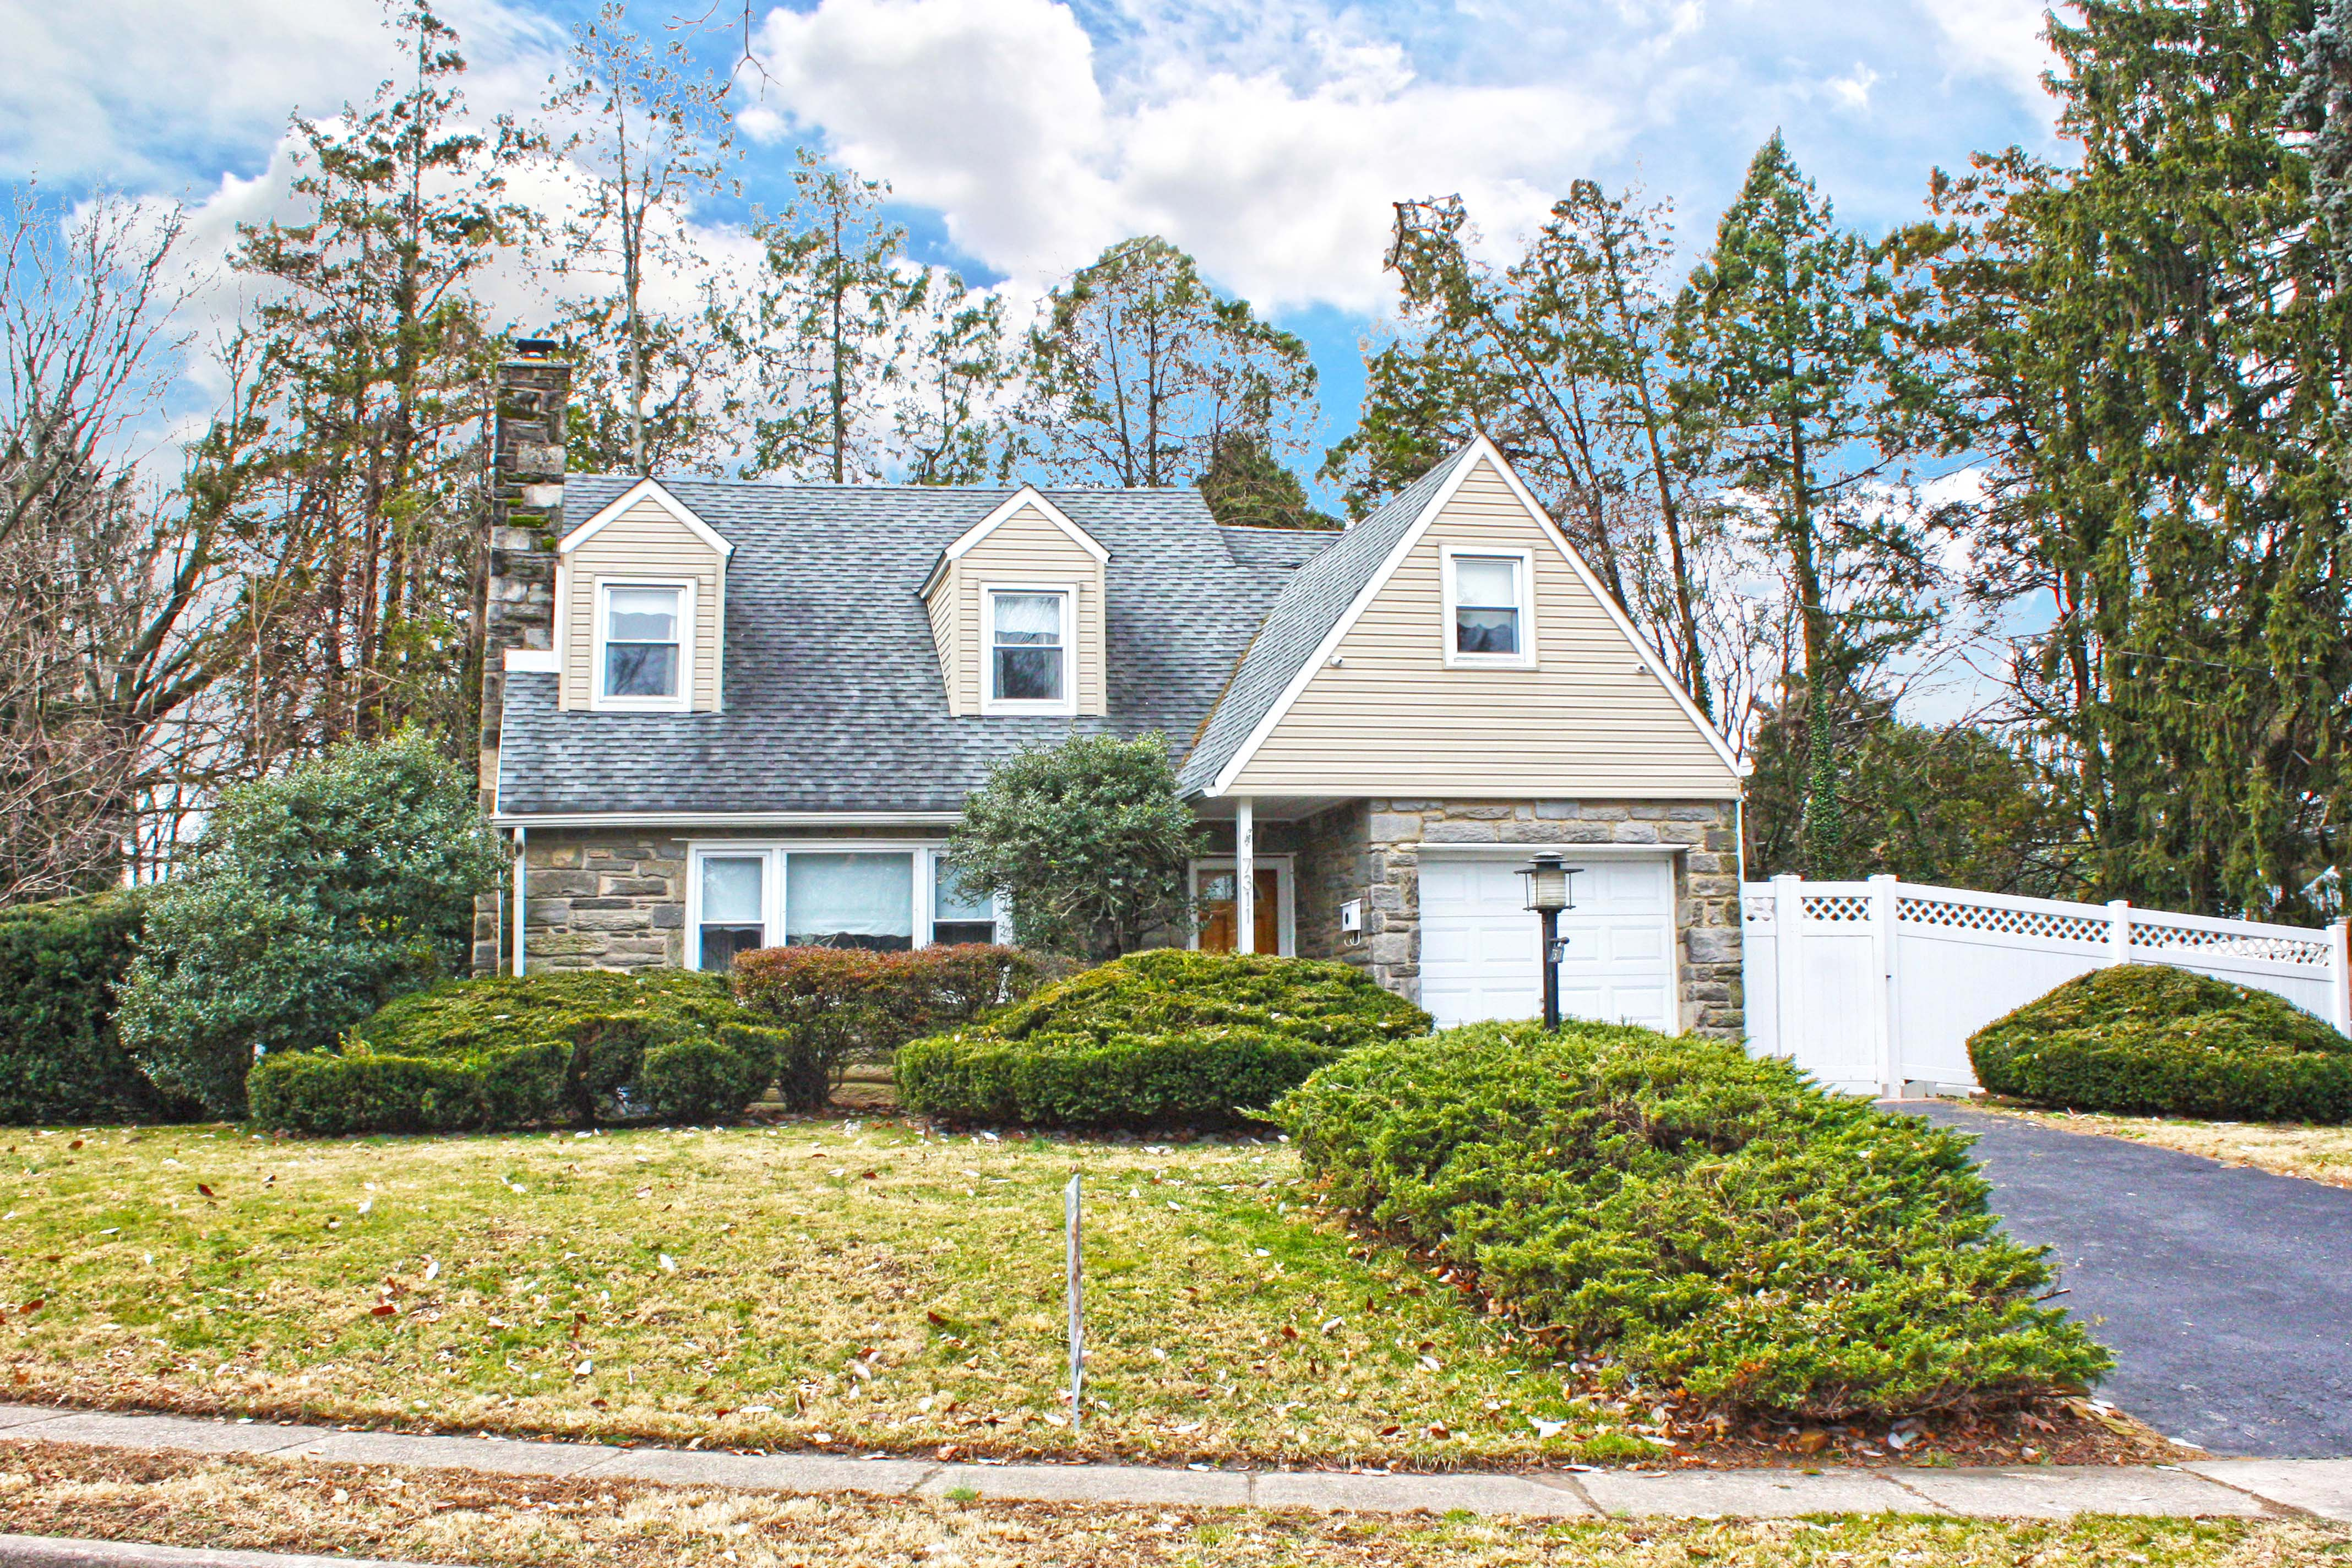 Elkins Park Home for Sale Just Listed in Oak Lane Manor!